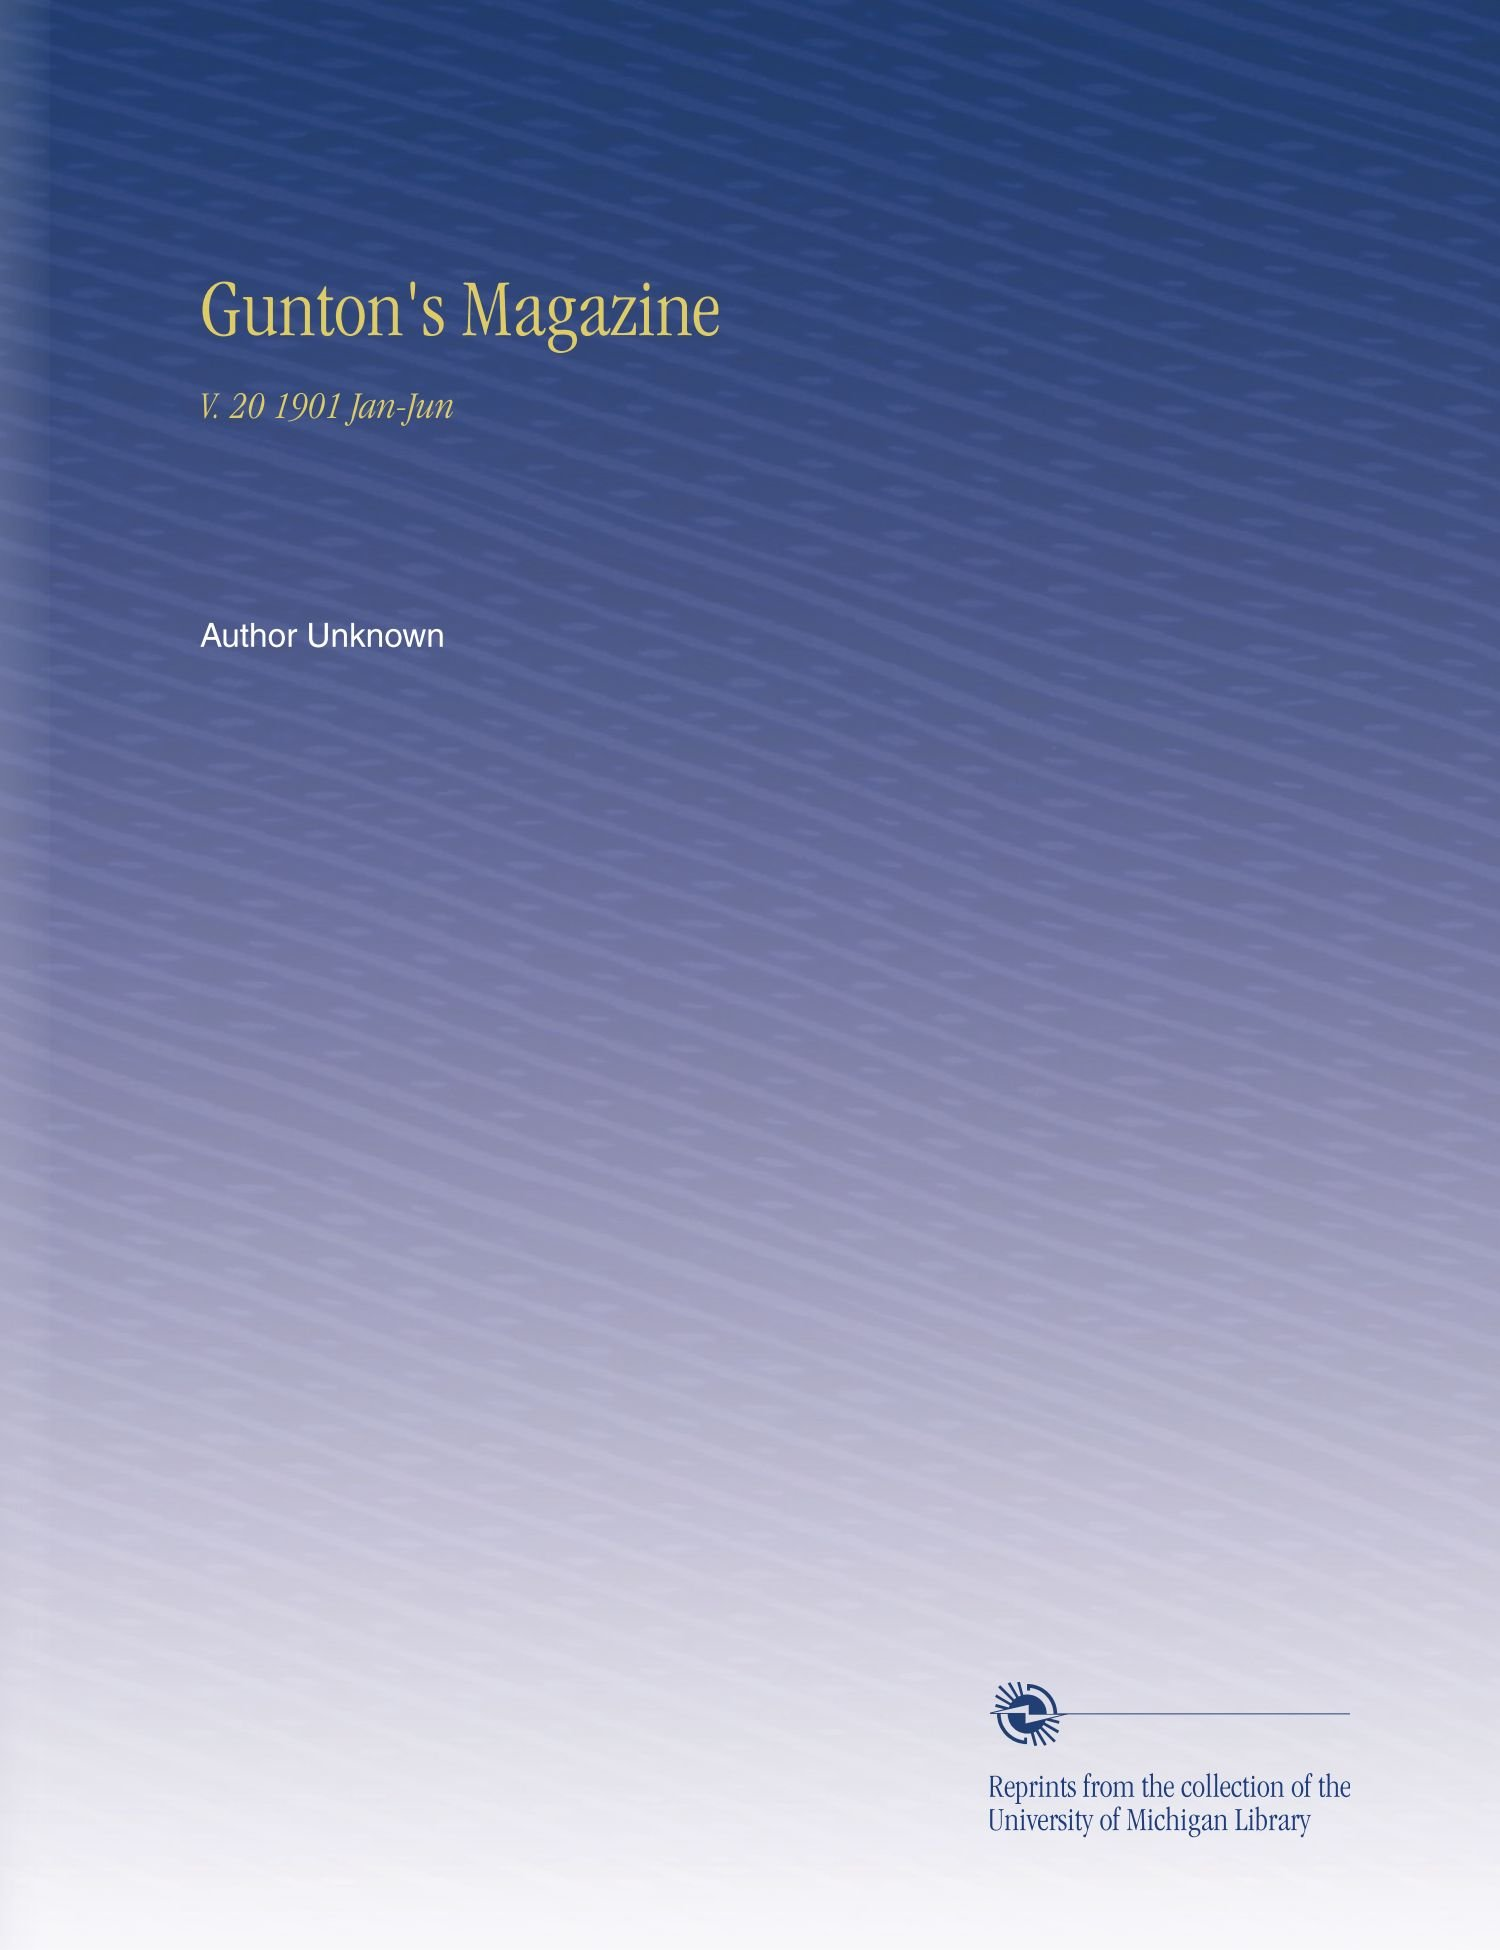 Gunton's Magazine: V. 20 1901 Jan-Jun PDF